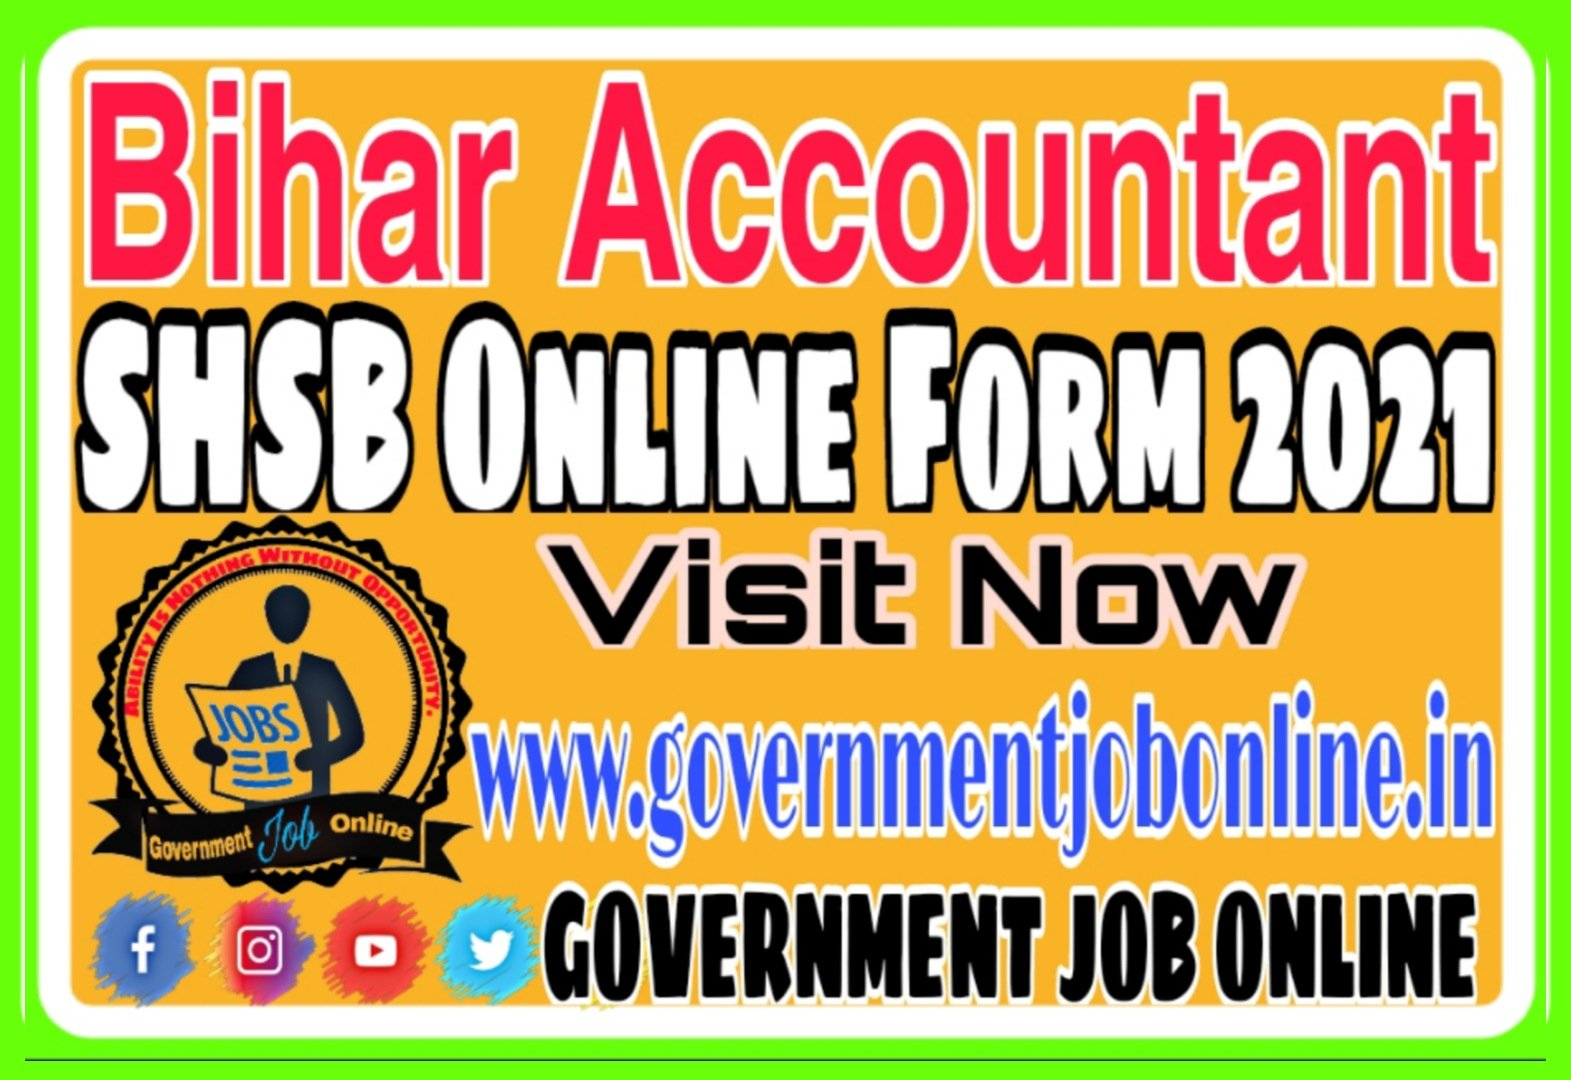 Bihar Accountant SHSB Online Form 2021